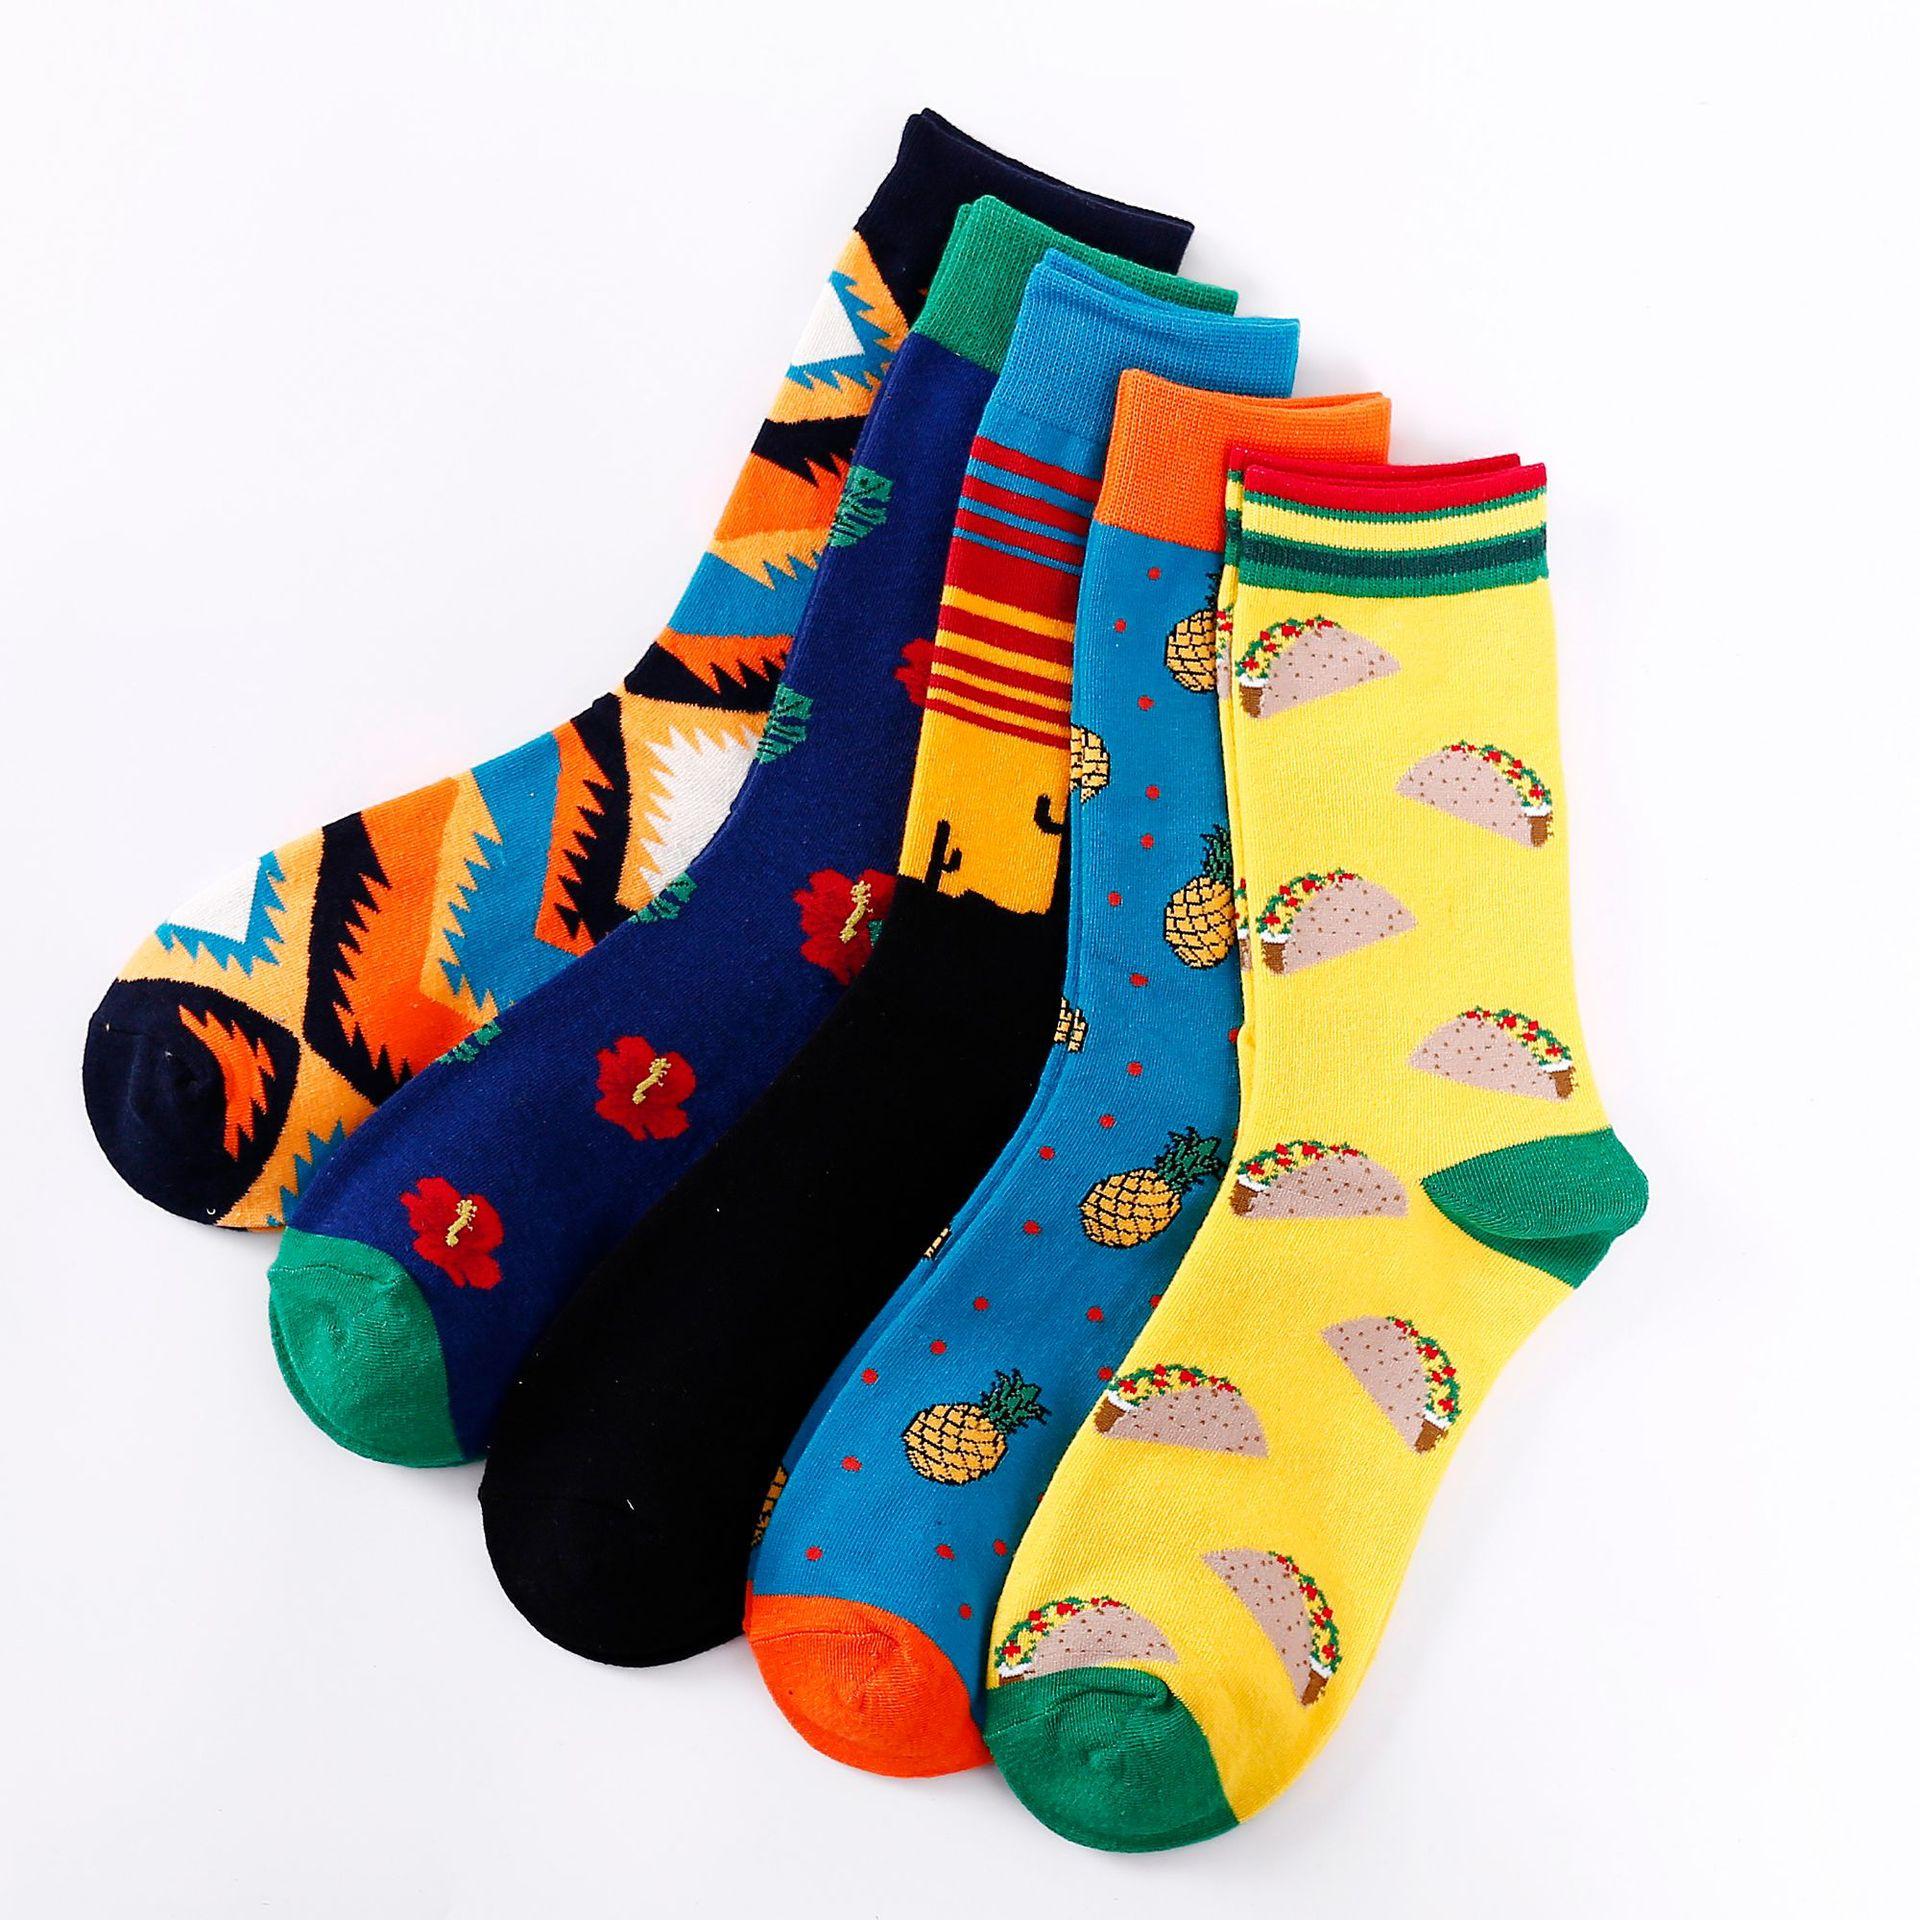 Colorful Women Men Socks Crew Socks Cotton Socks New Sandwiches Pineapple Socks Happy Funny Harajuku